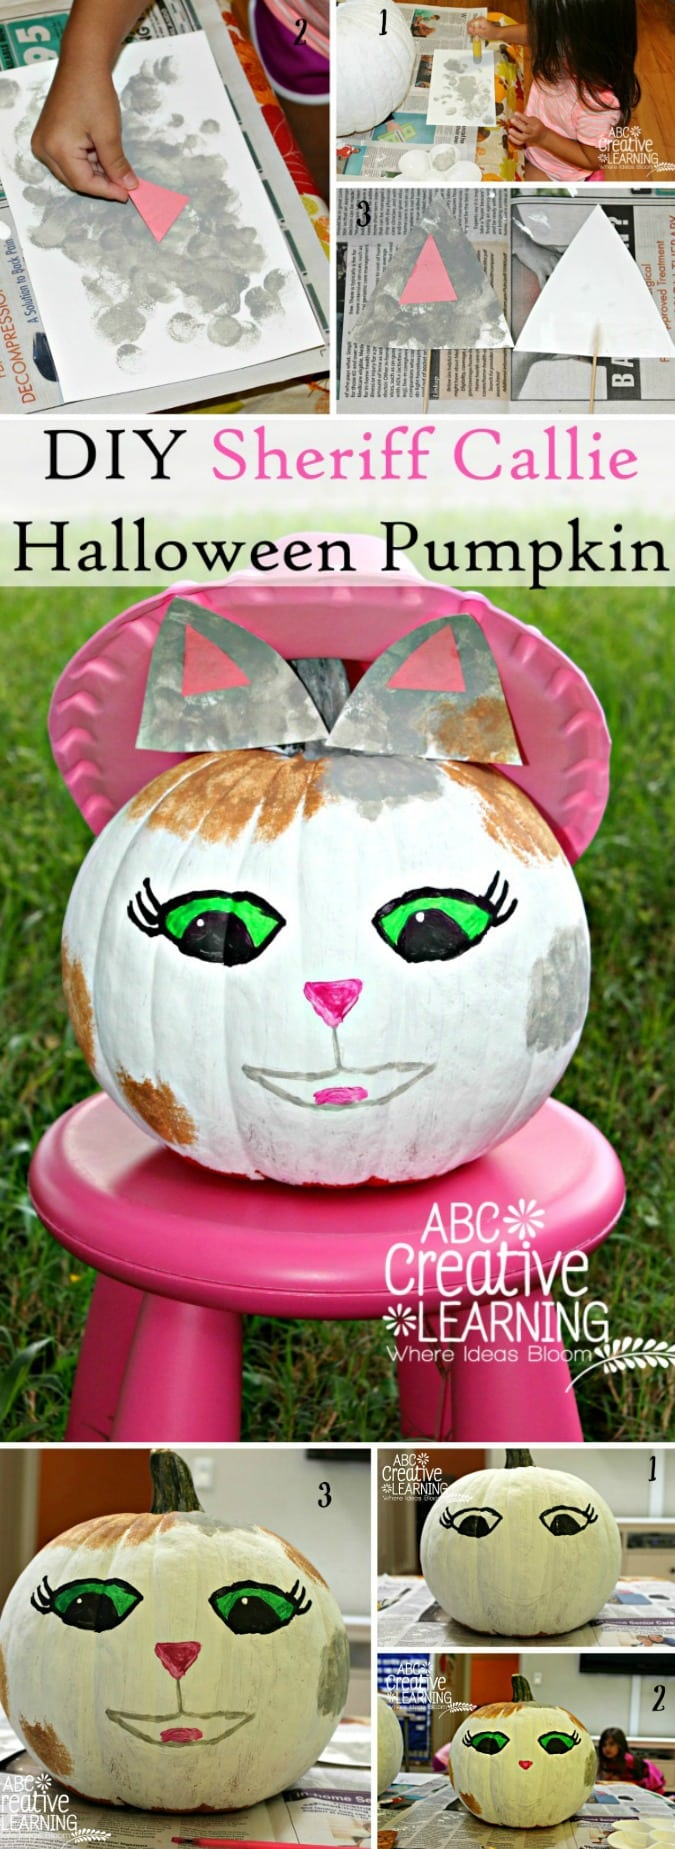 DIY Sheriff Callie Halloween Pumpkin Craft - simplytodaylife.com